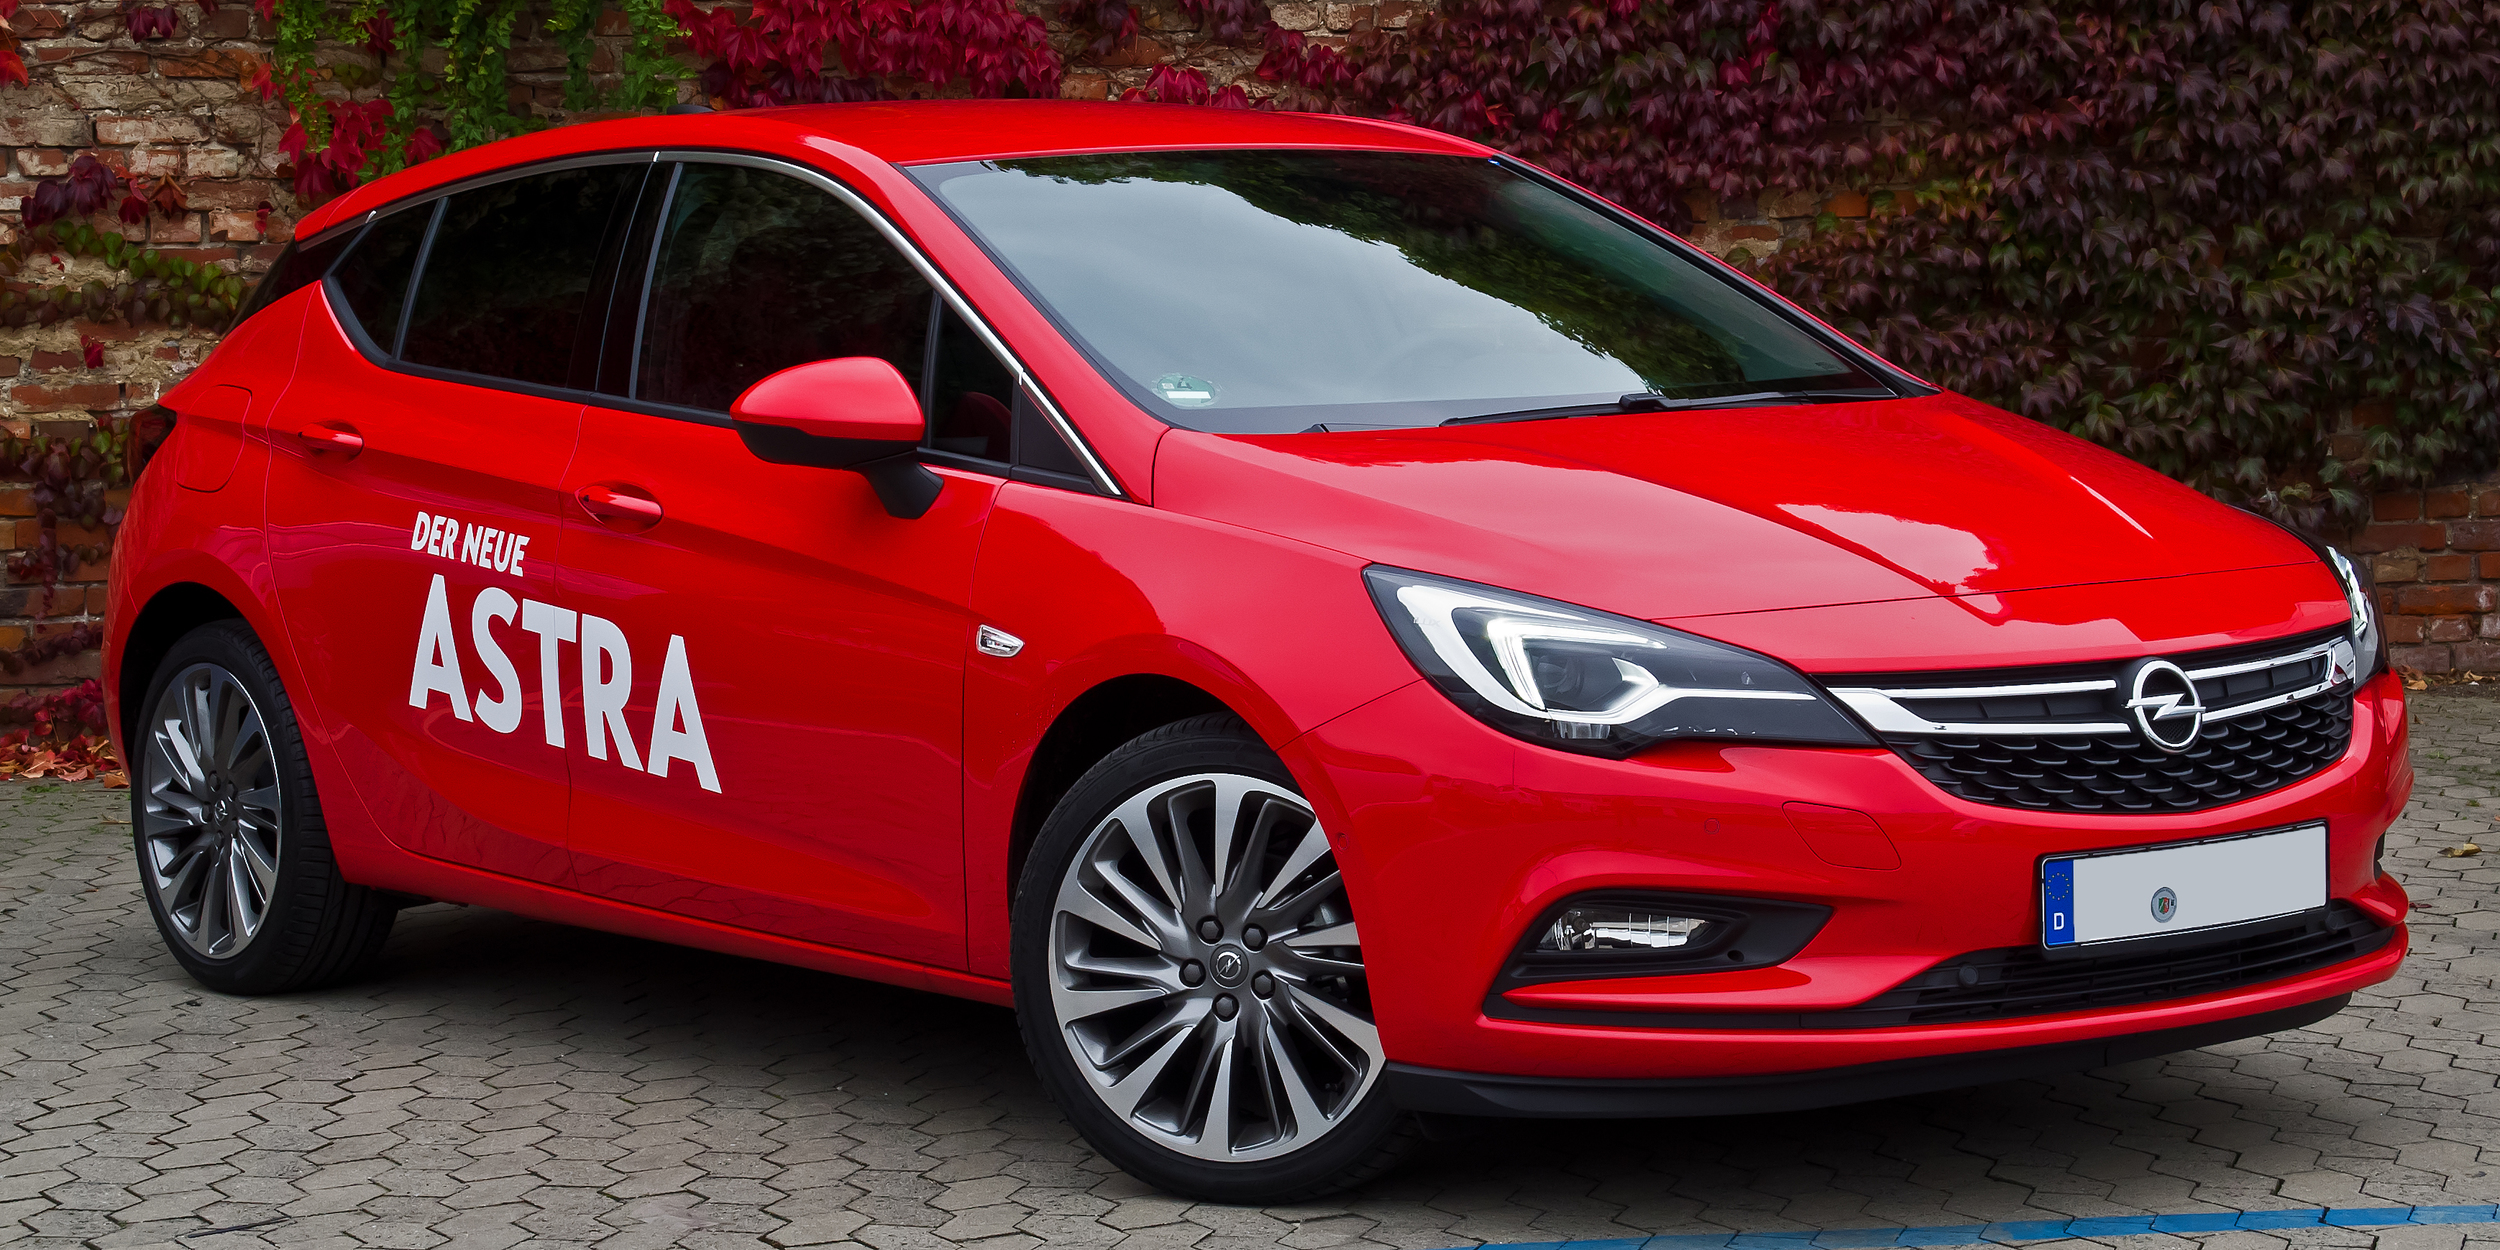 Opel_Astra_1.4_EDIT_ecoFLEX_Innovation_(K)_–_Frontansicht,_10._Oktober_2015,_Düsseldorf.jpg